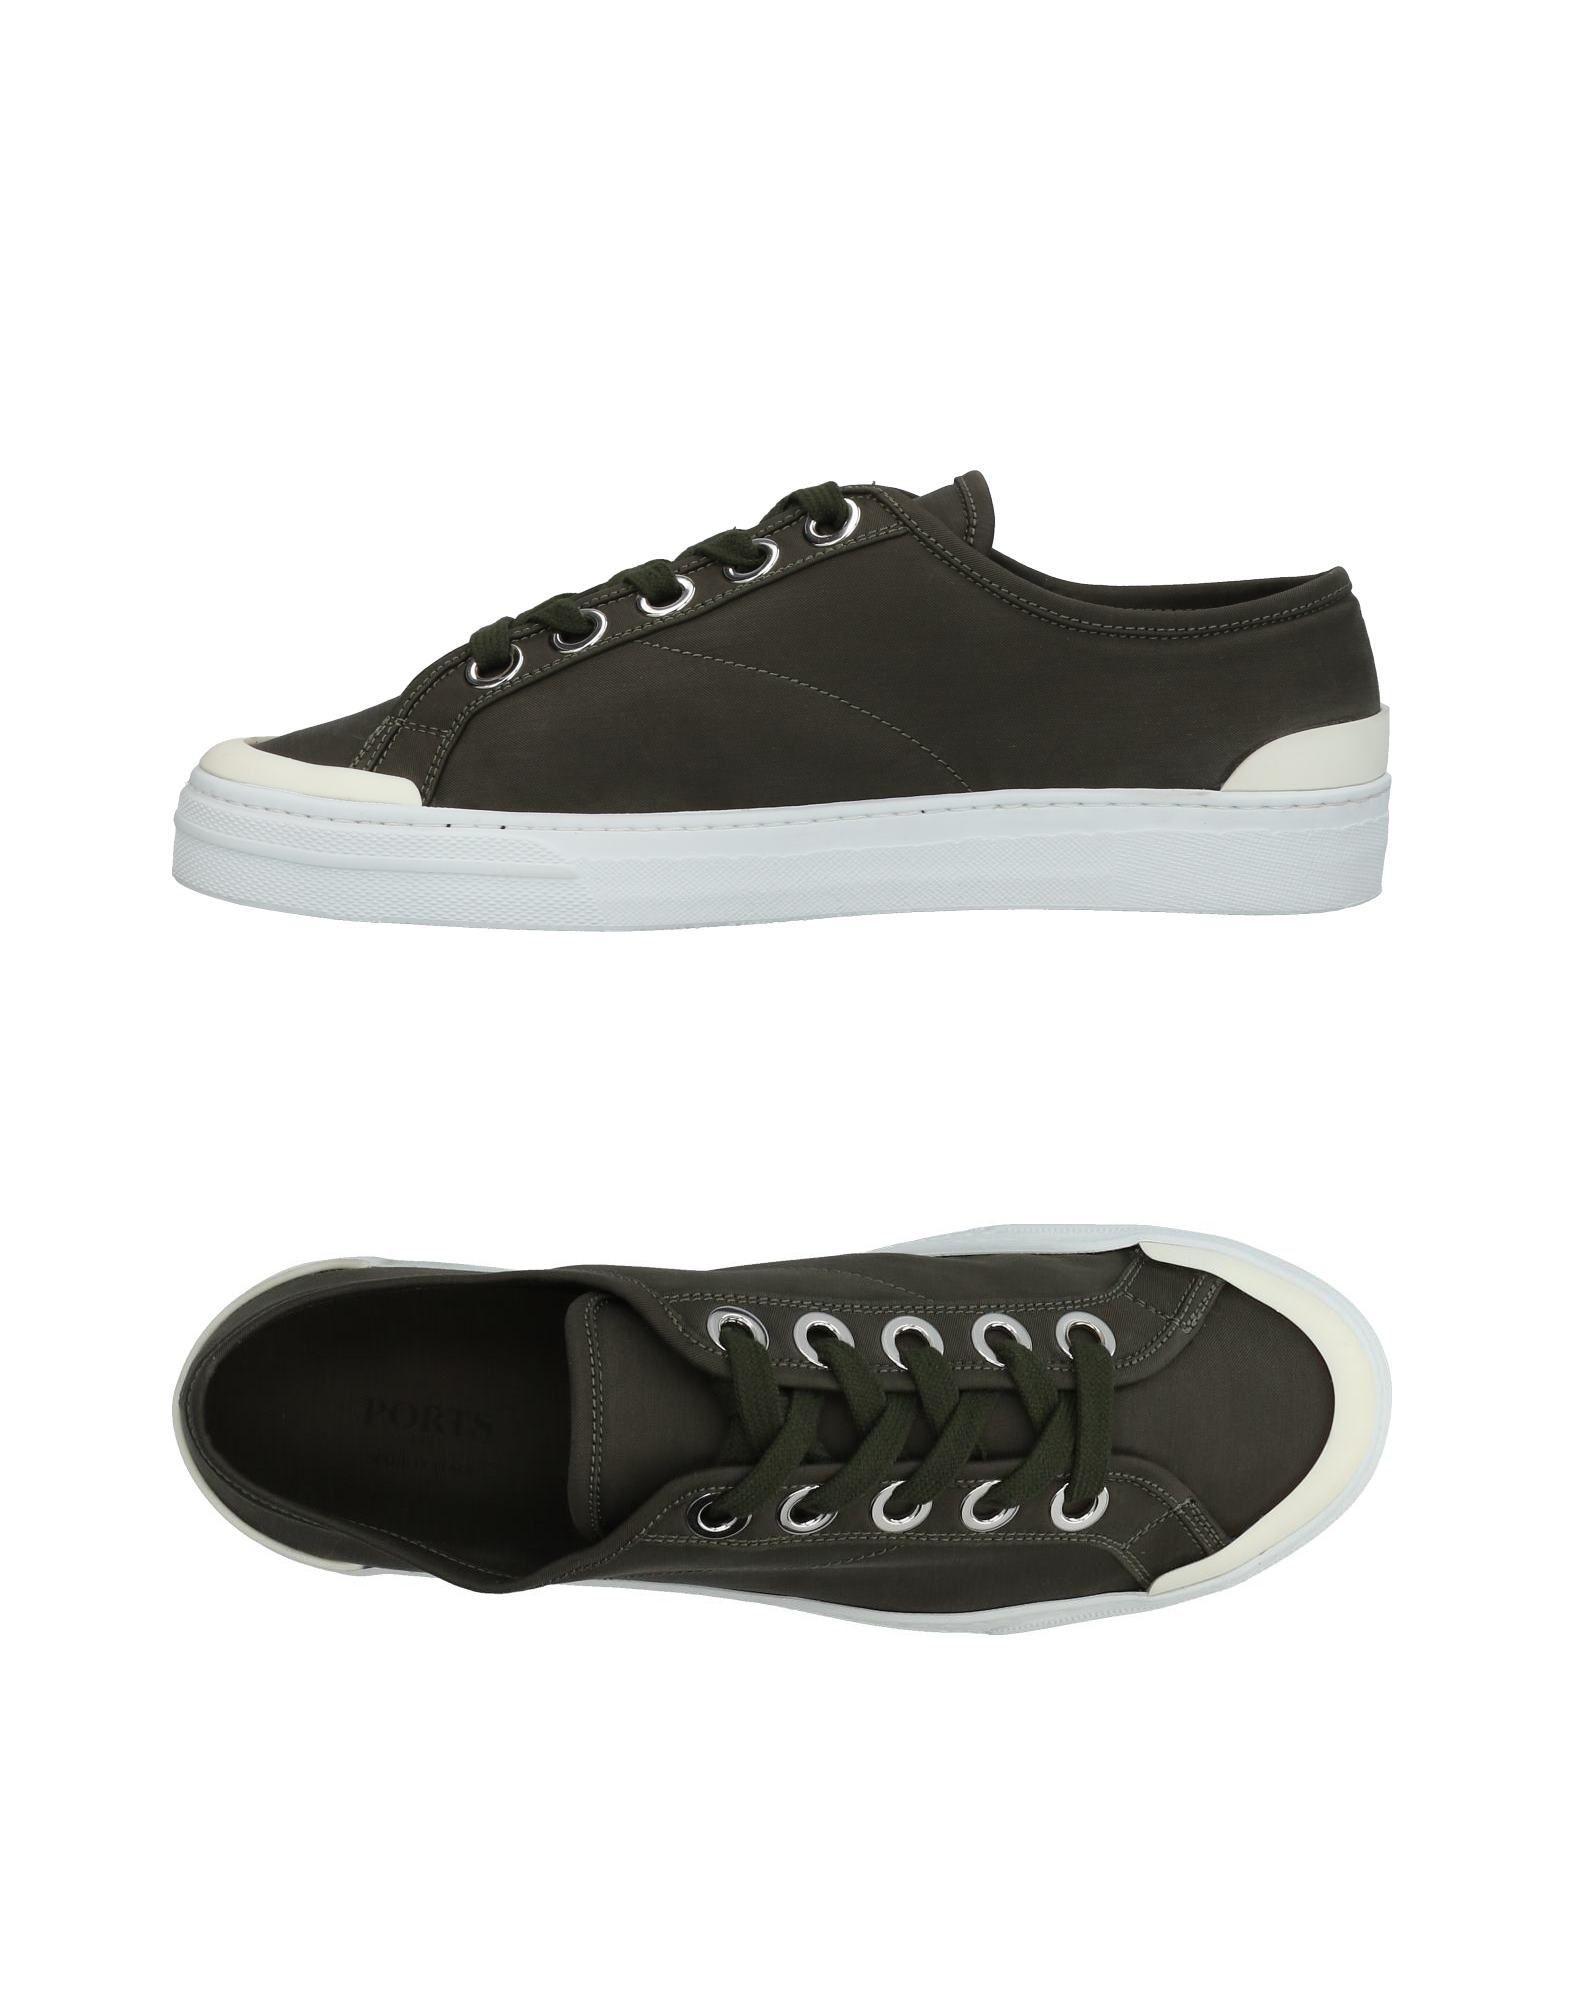 Stilvolle billige Schuhe Ports 1961 Sneakers Damen  11440406GJ